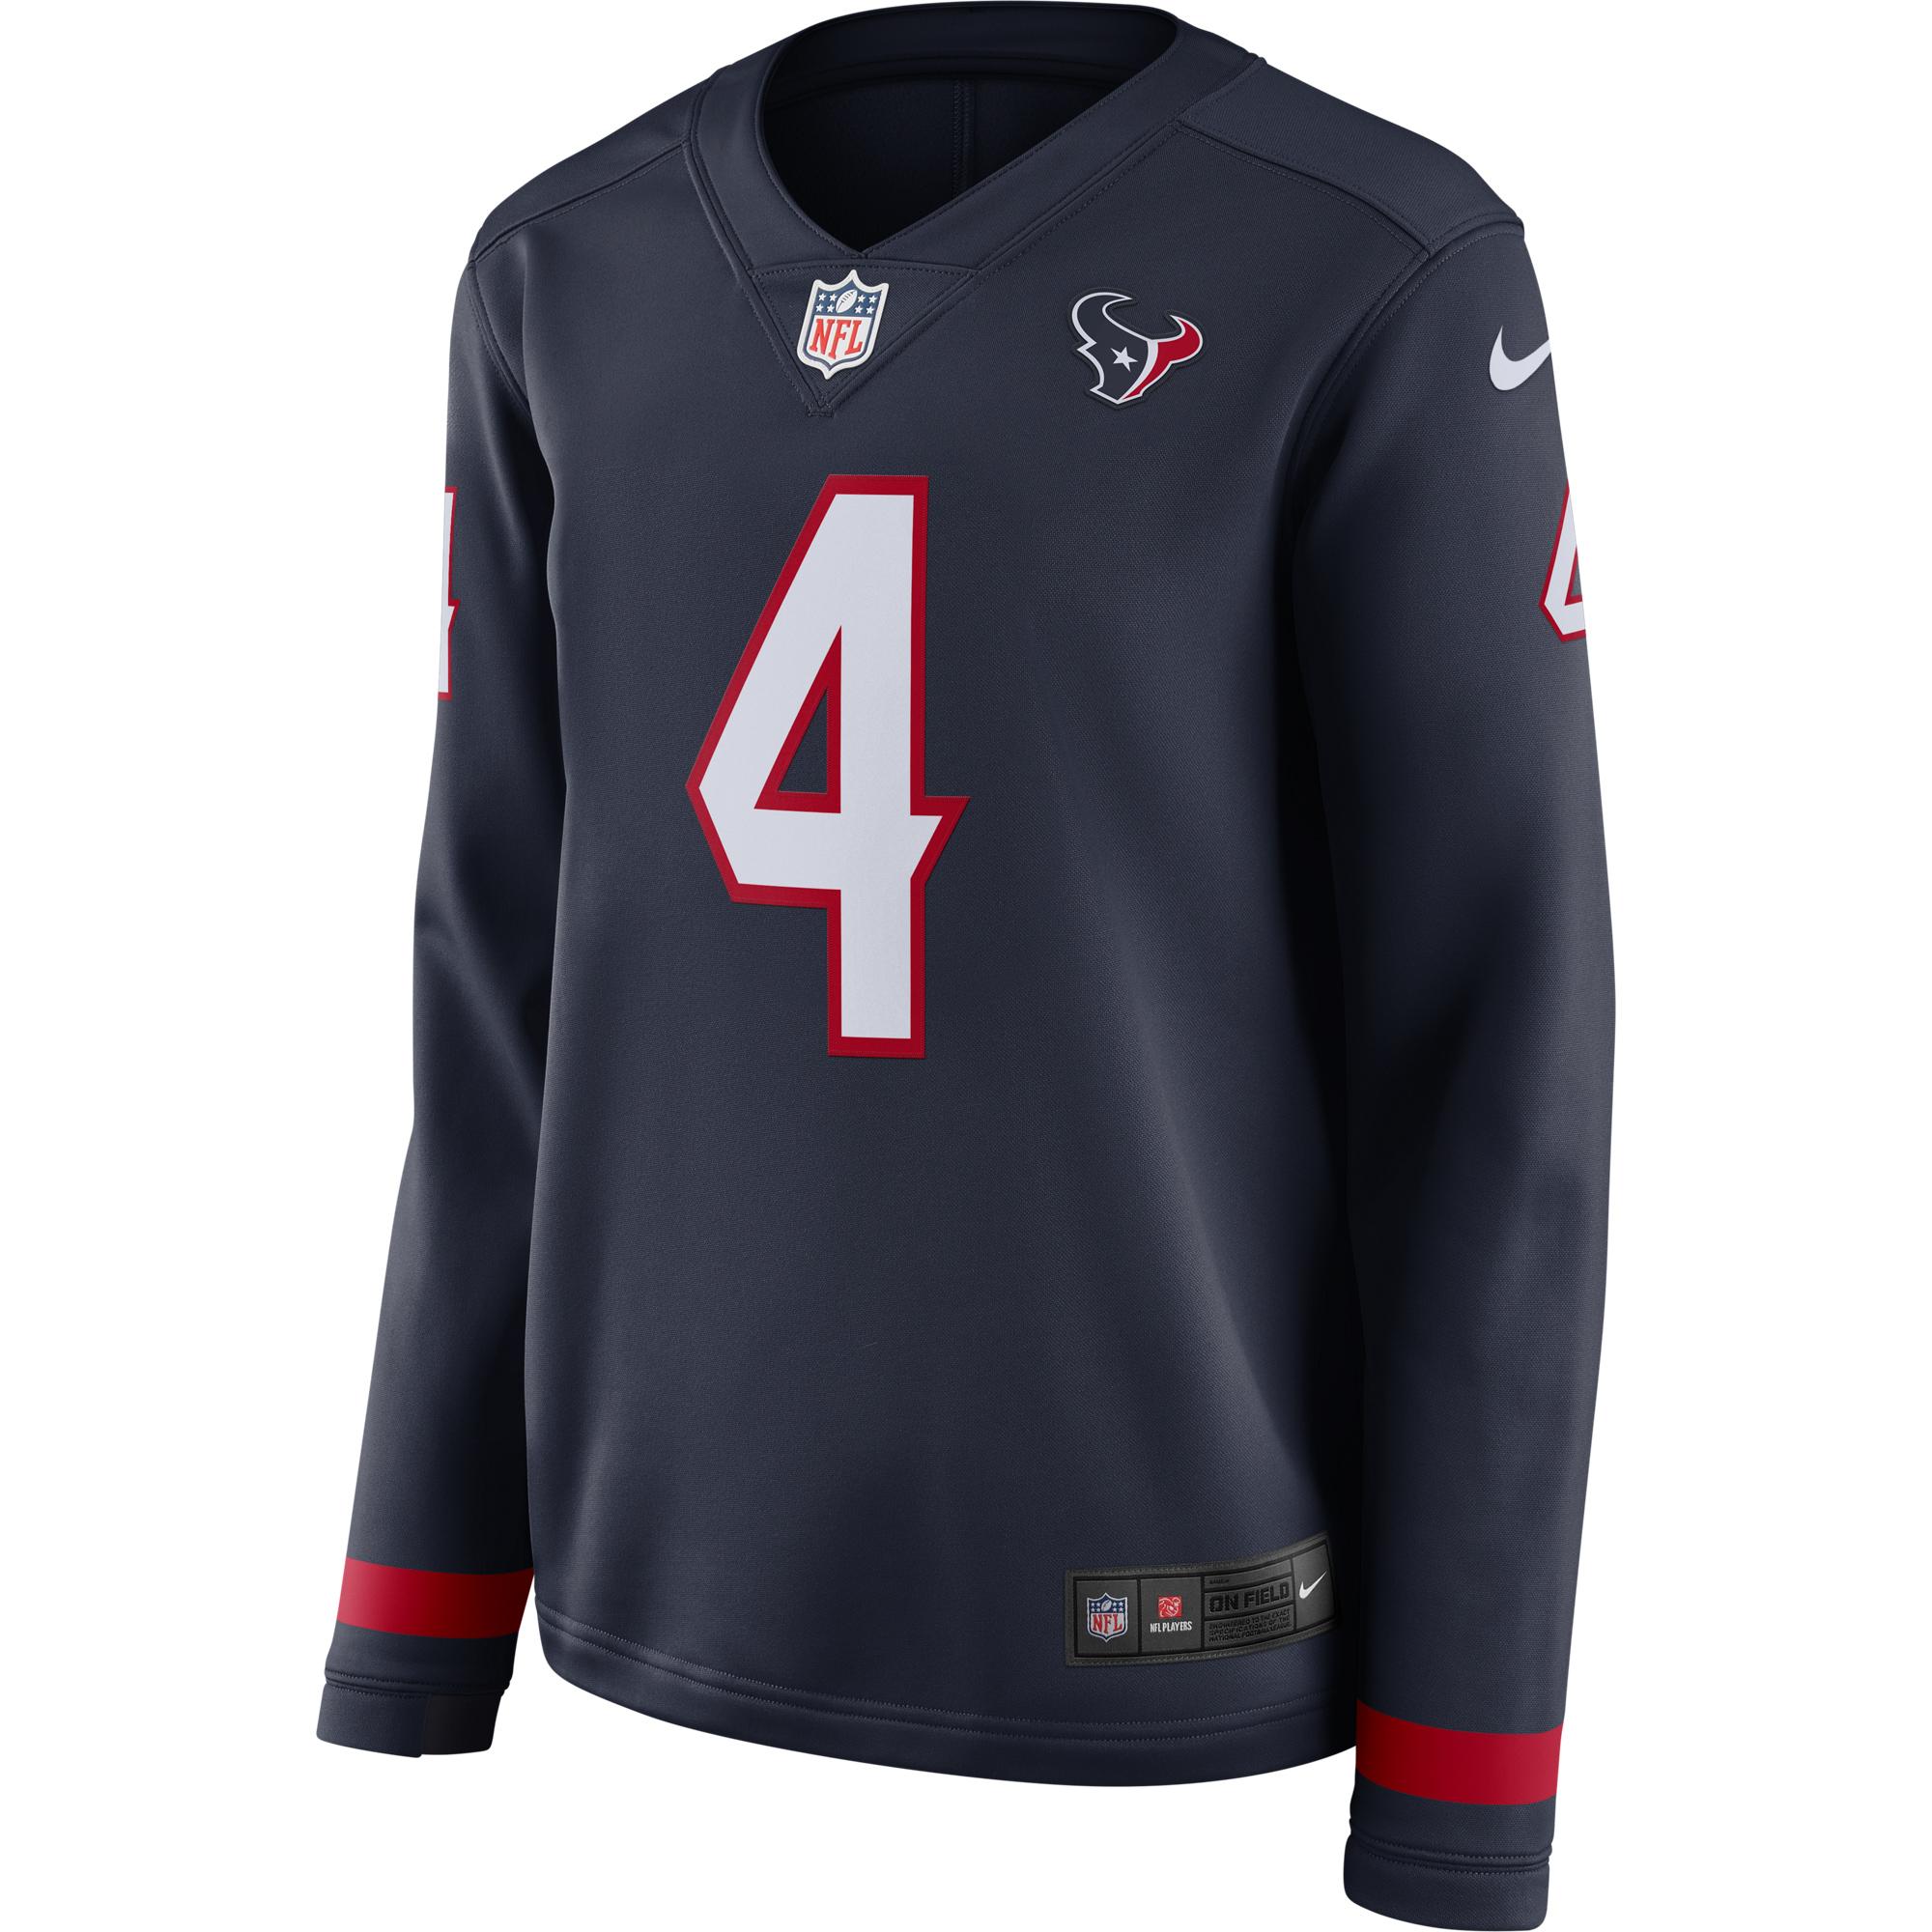 detailing be484 0c1e1 Deshaun Watson Houston Texans Nike Women's Therma Long Sleeve Jersey - Navy